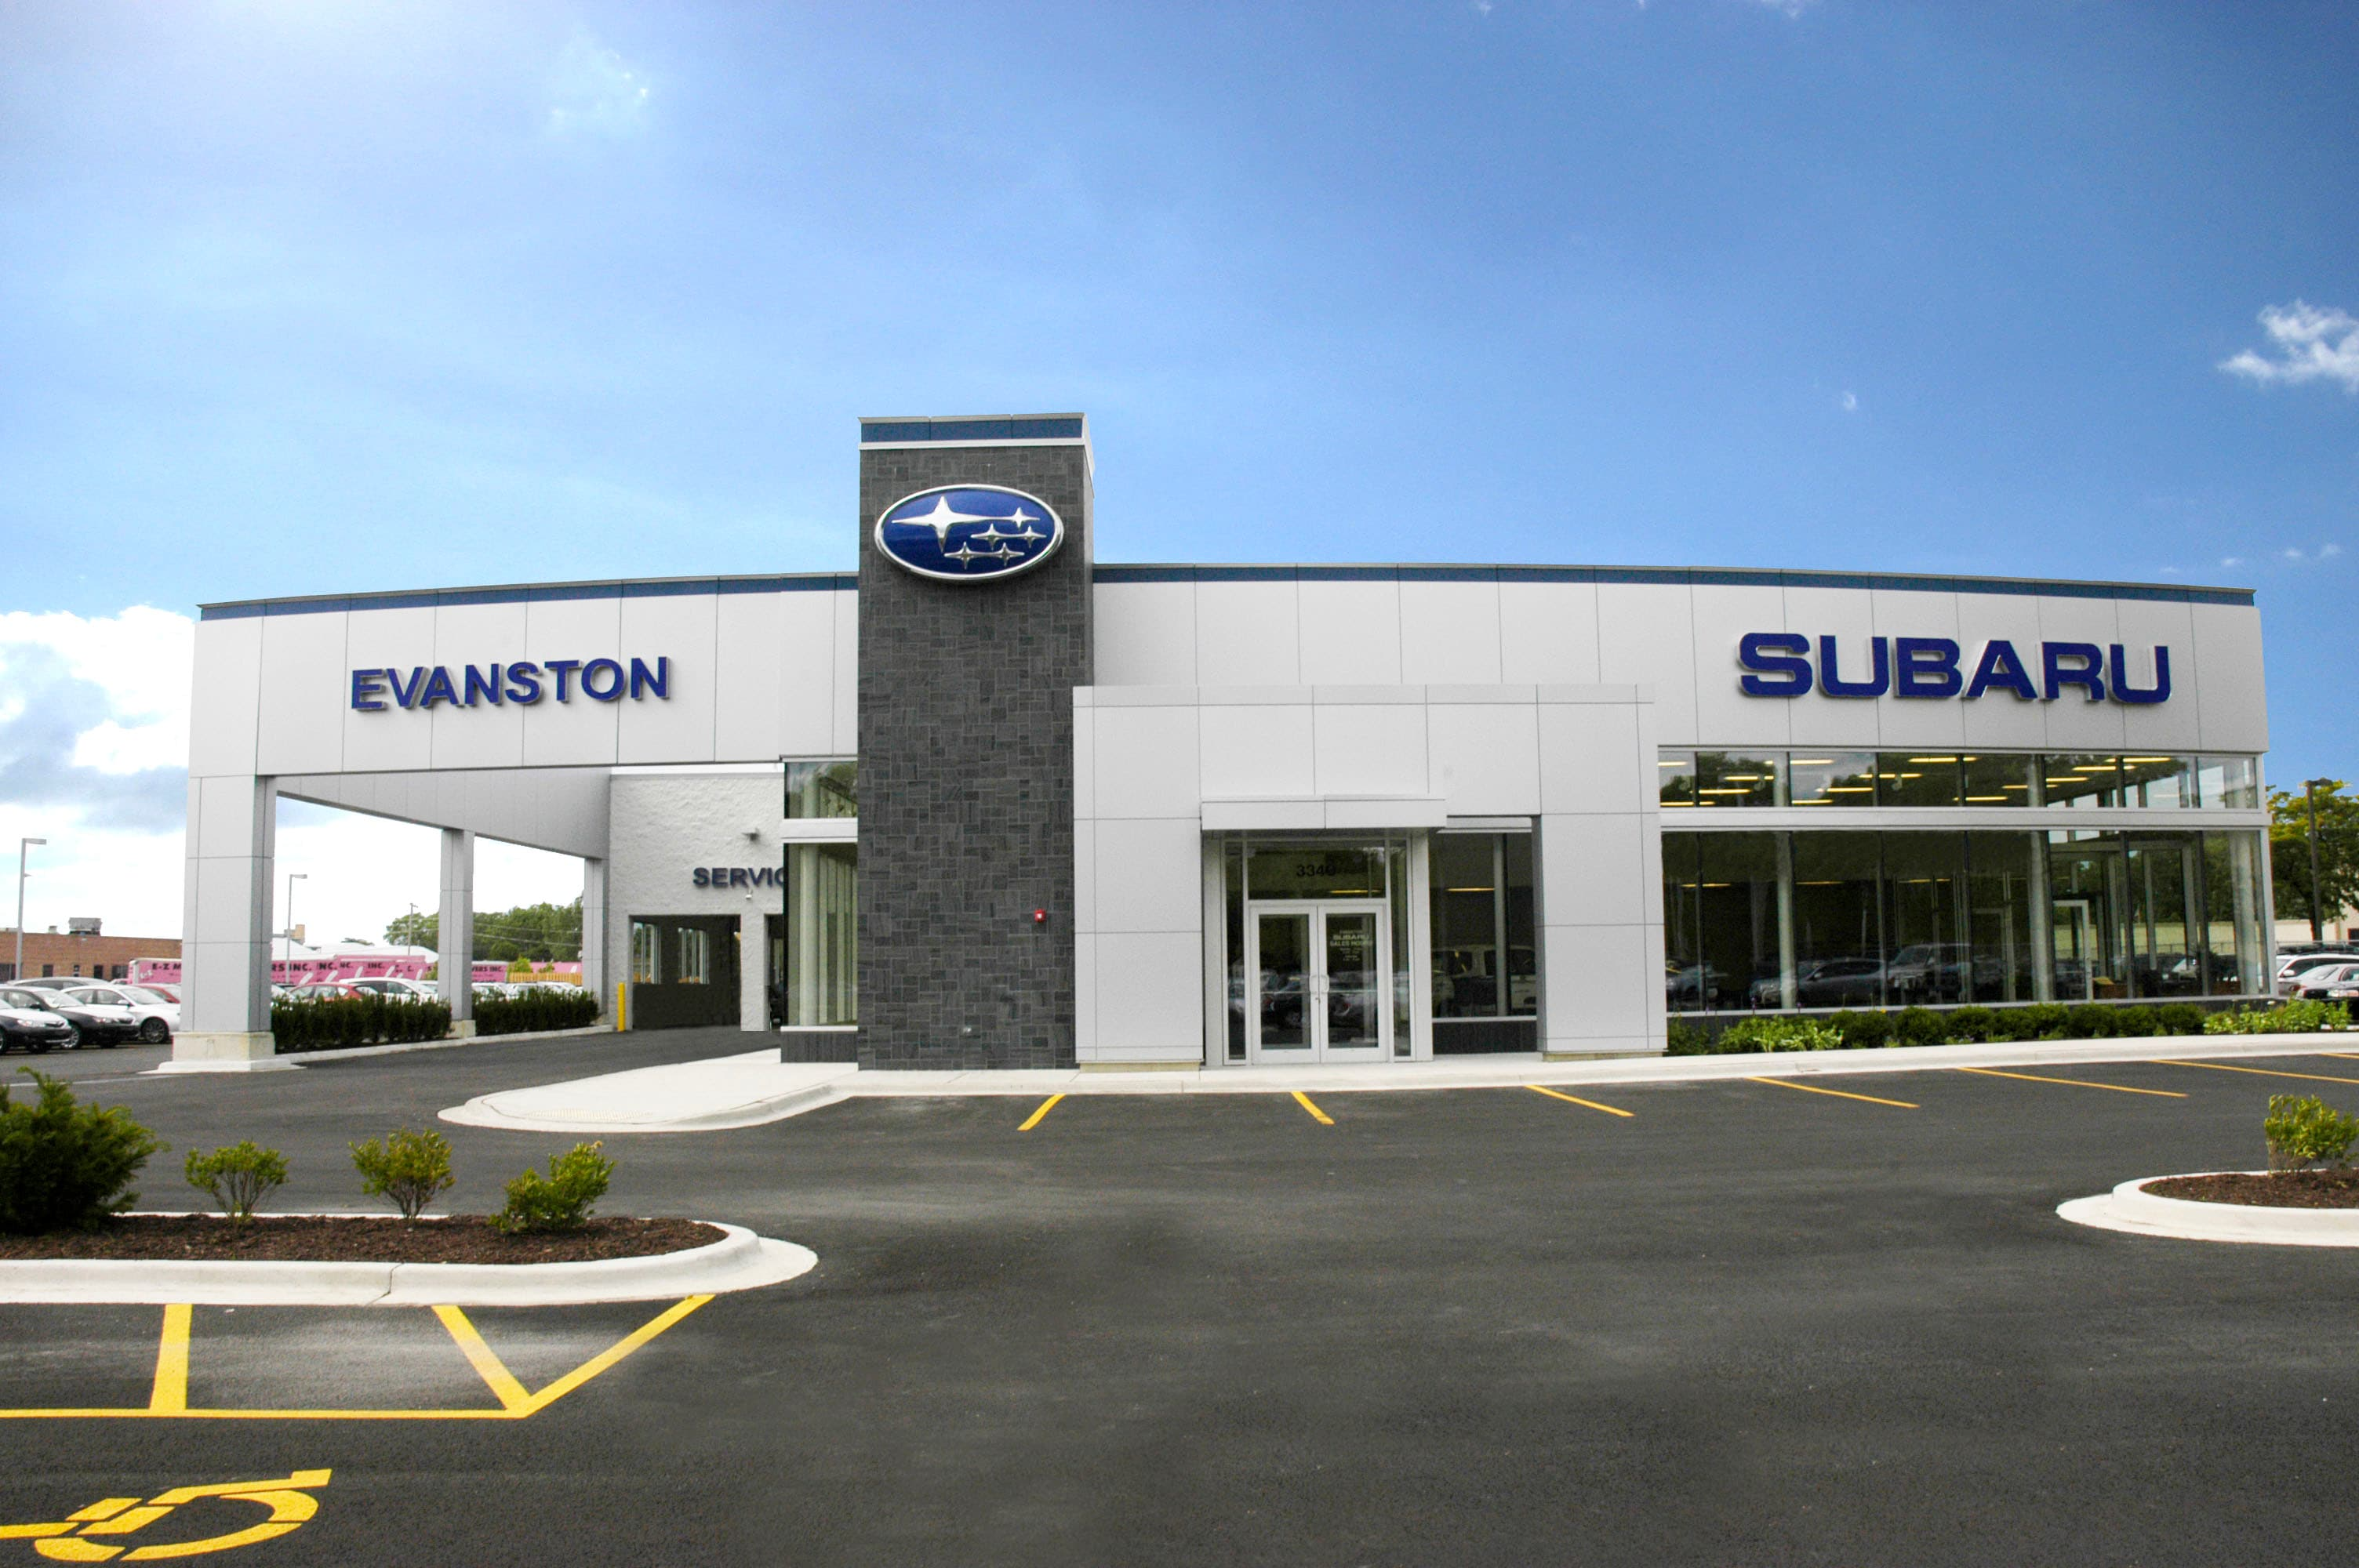 New Subaru Used Car Dealership Near Duluth Mn Serving ...